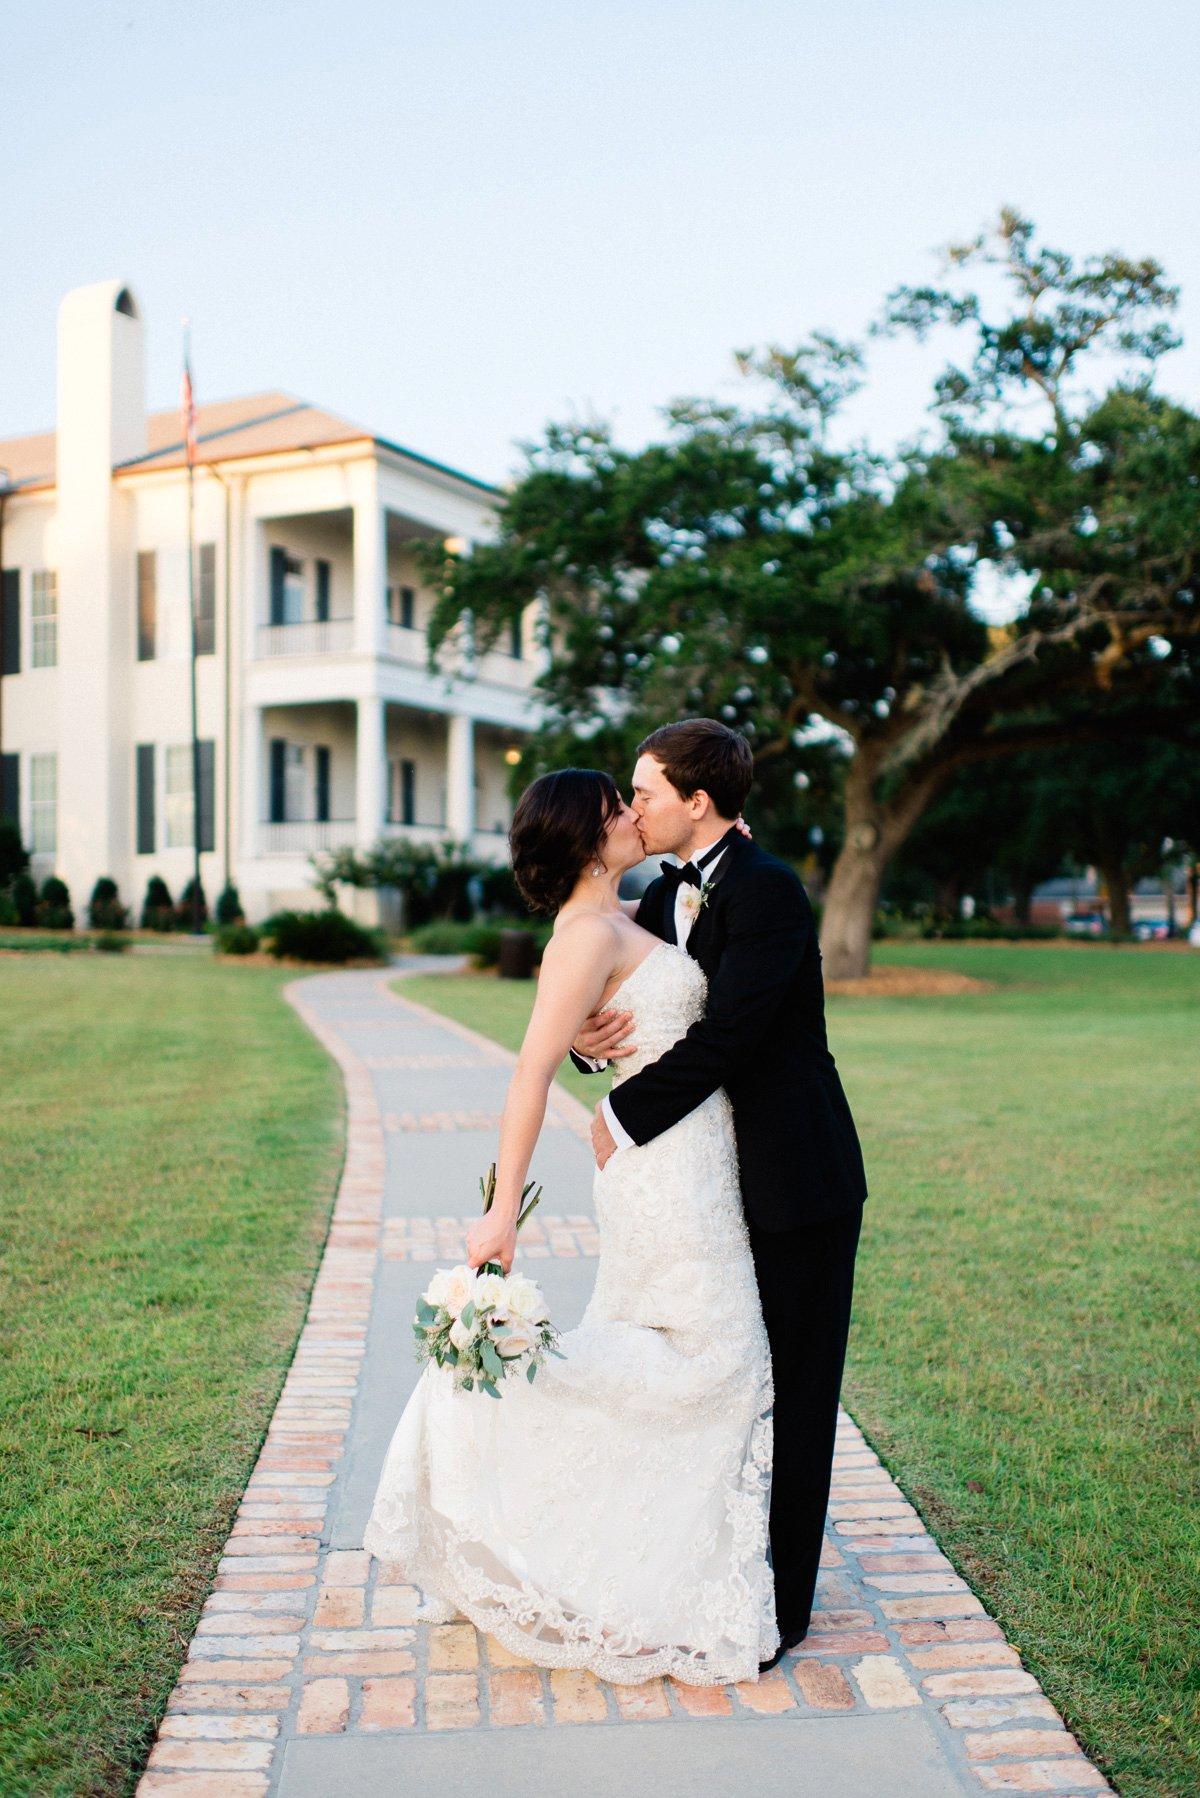 bridal photography at biloxi visitor center by biloxi mississippi wedding photographer